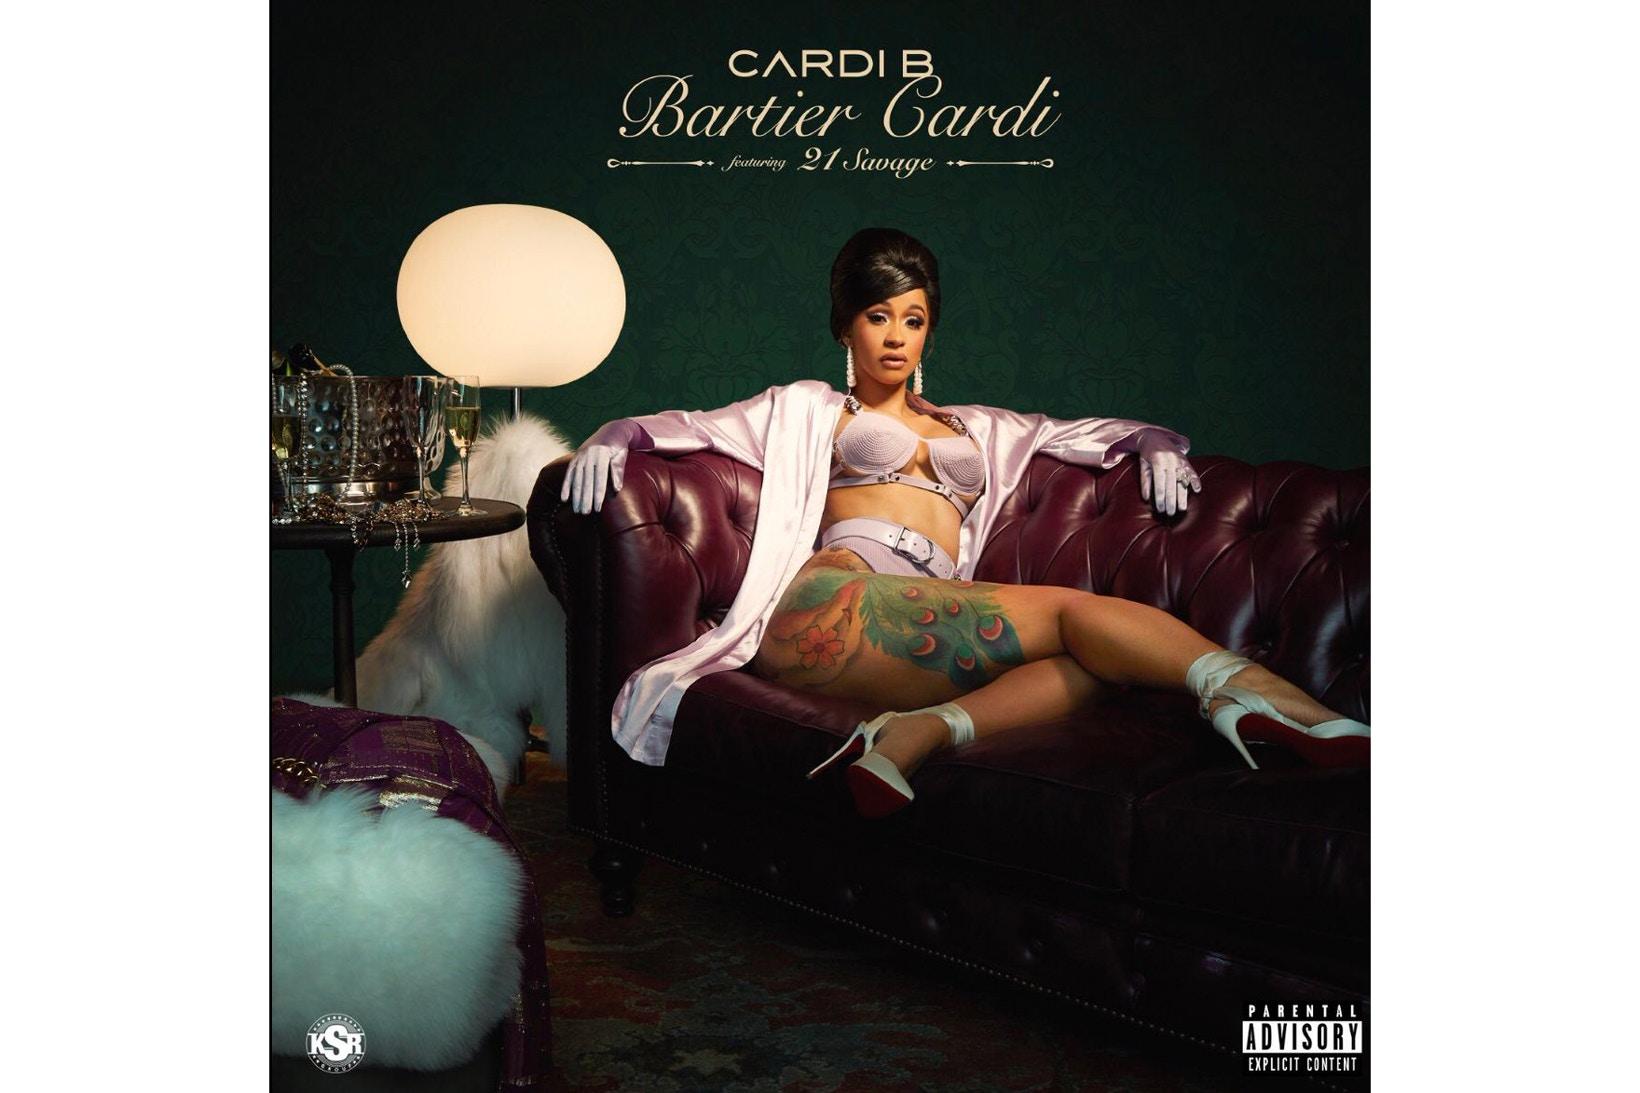 cardi-b-21-savage-bartier-cardi-music-11.jpg